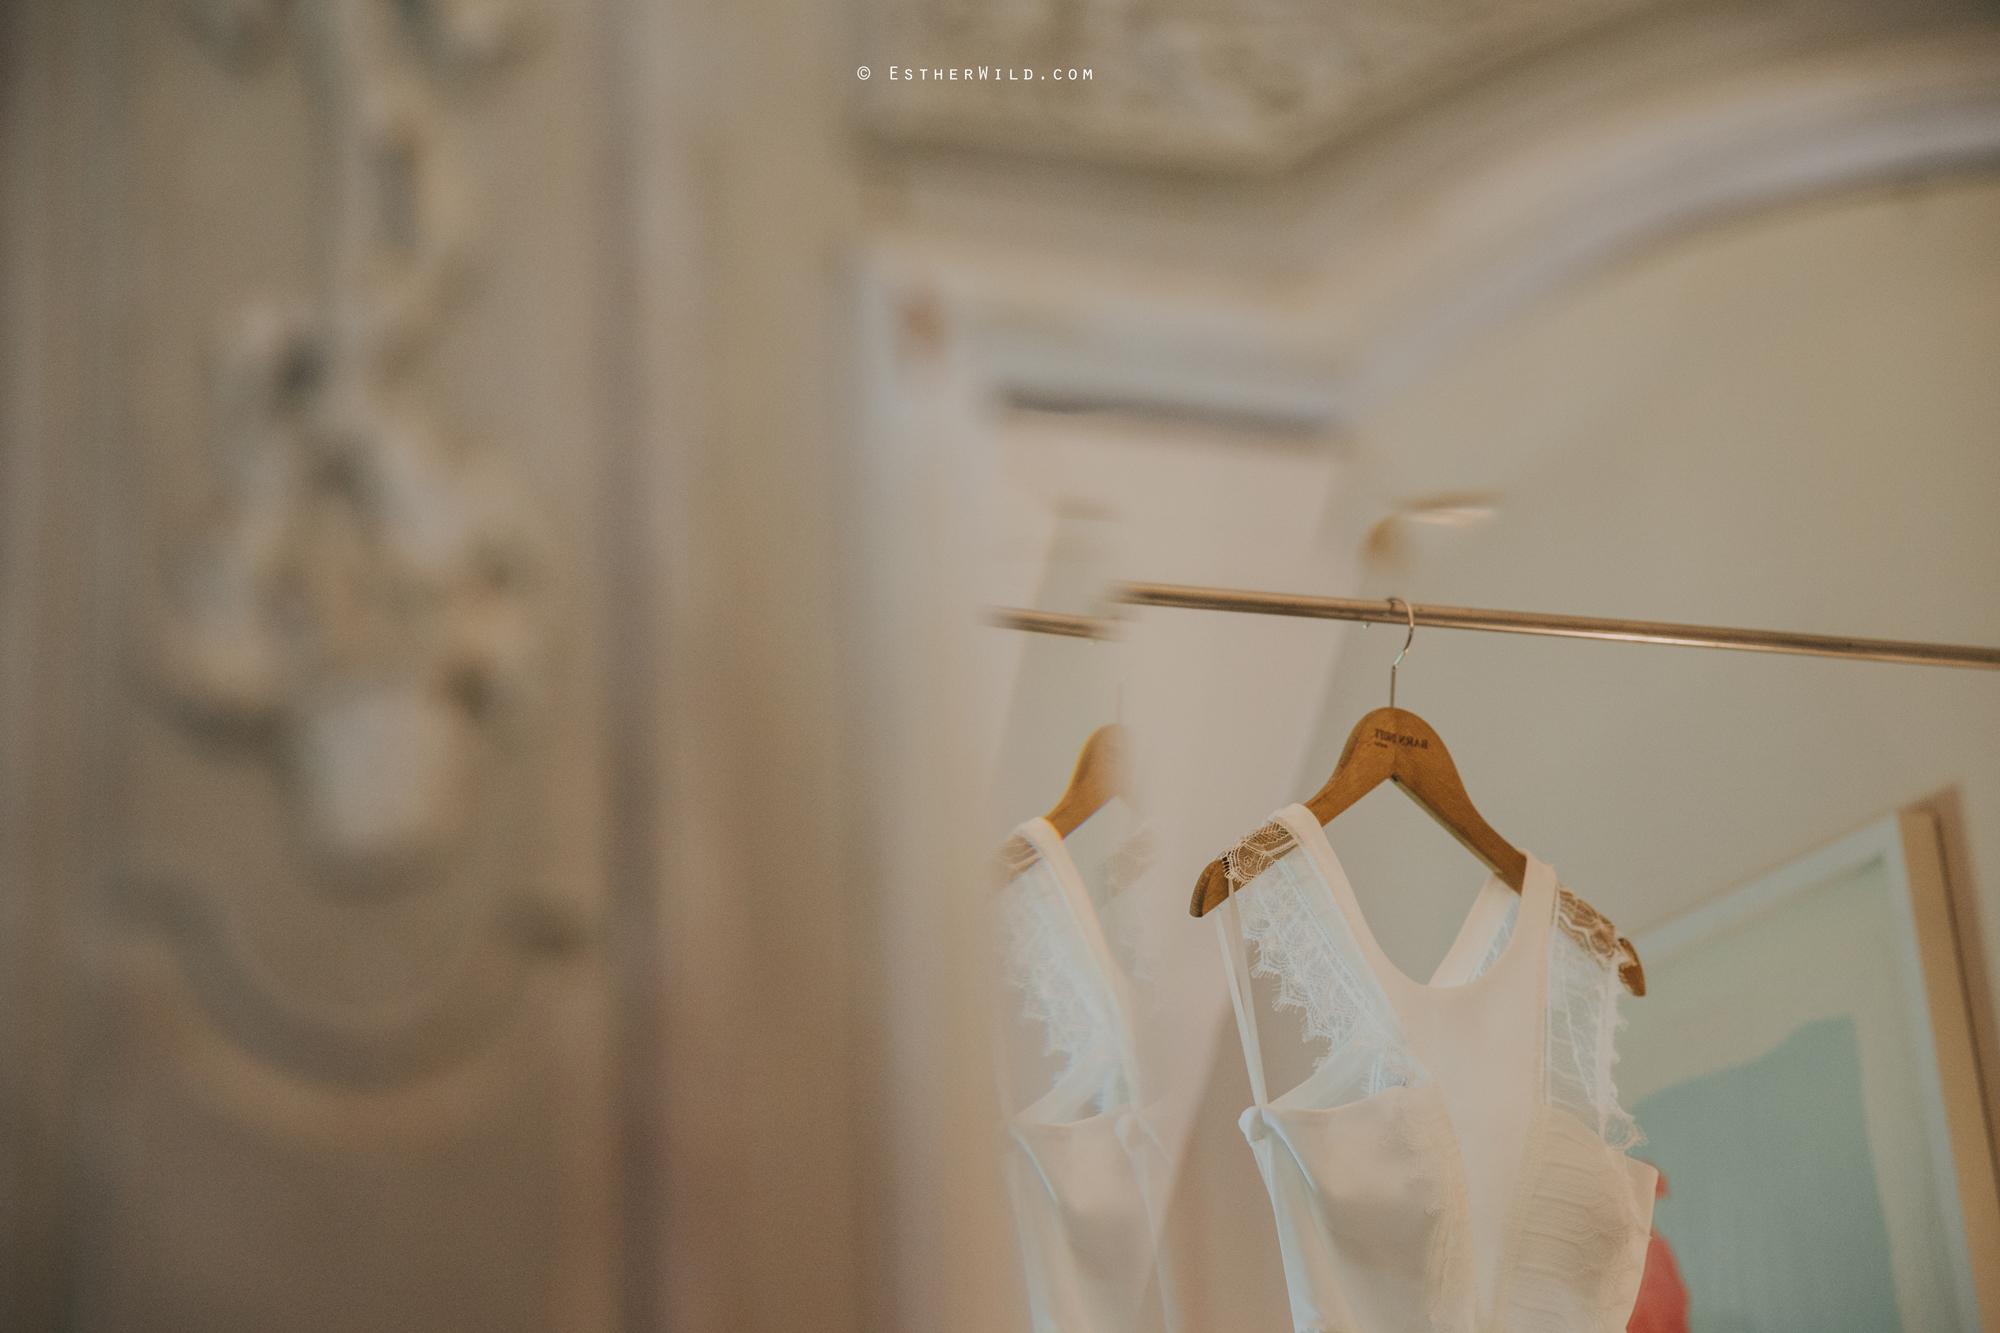 IMG_0097Cley_Barn_Drift_Norfolk_Coast_Wedding_Copyright_Esther_Wild_Photographer_.jpg